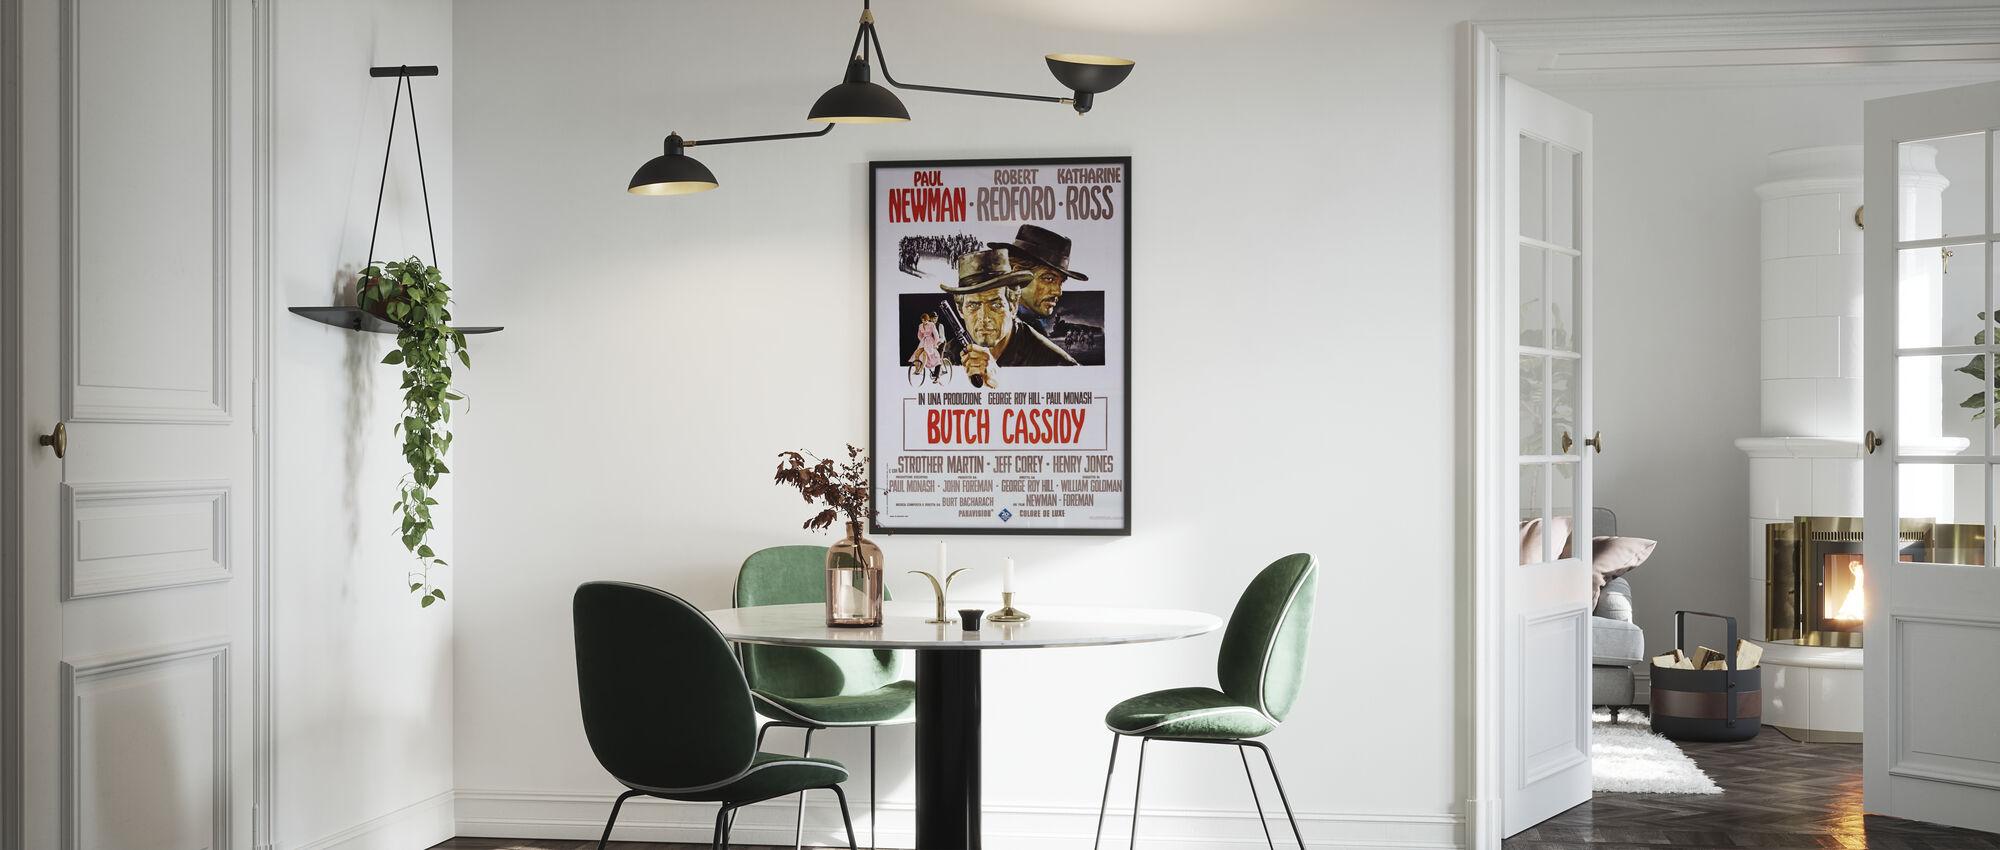 Butch Cassidy en de Sundance Kid II - Poster - Keuken